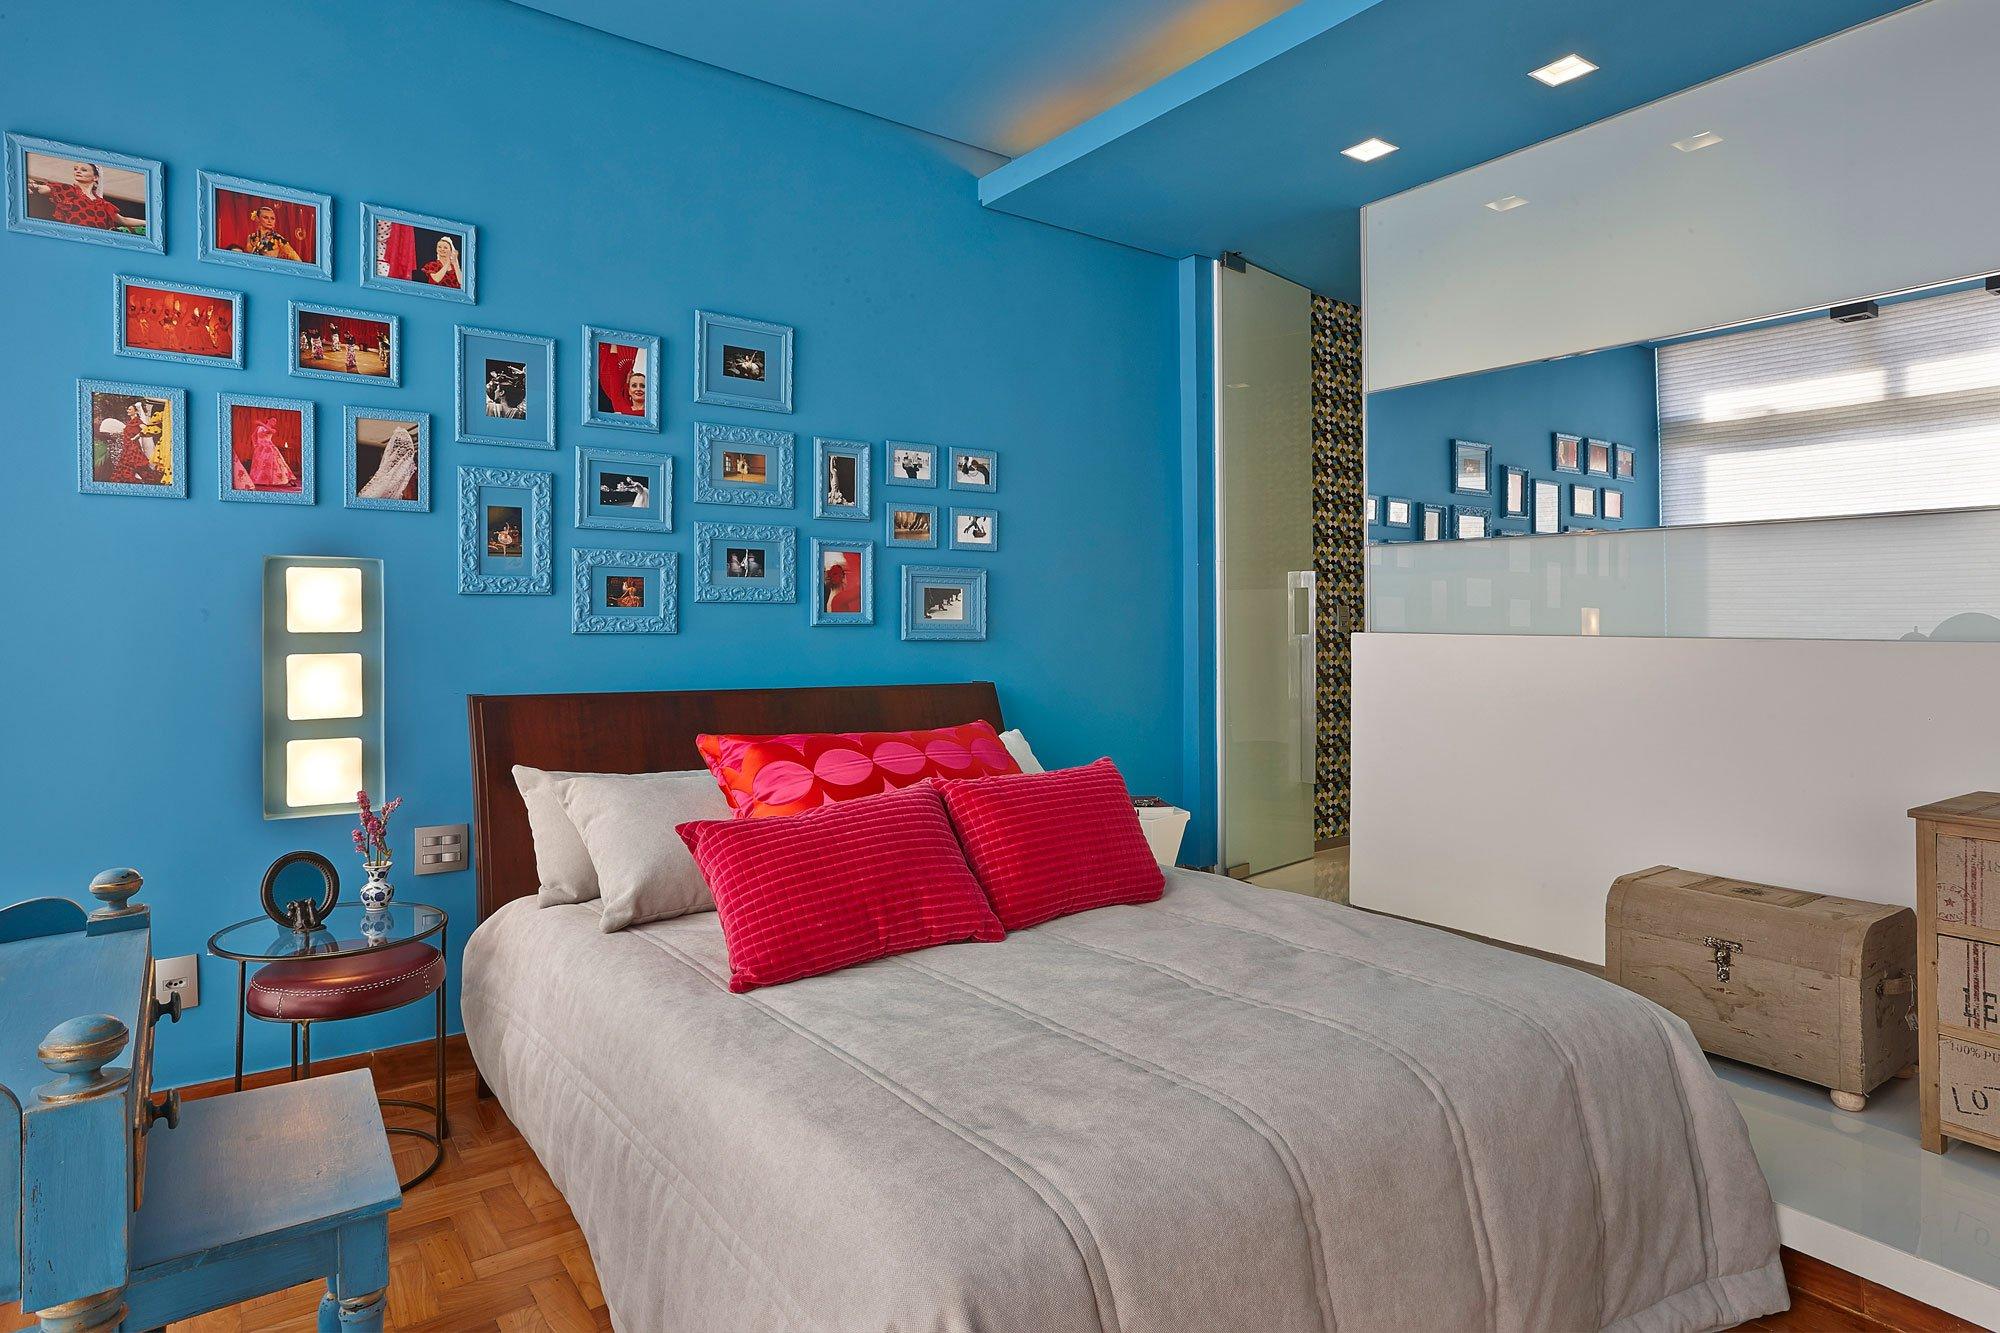 Apartment-in-Belo-Horizonte-19